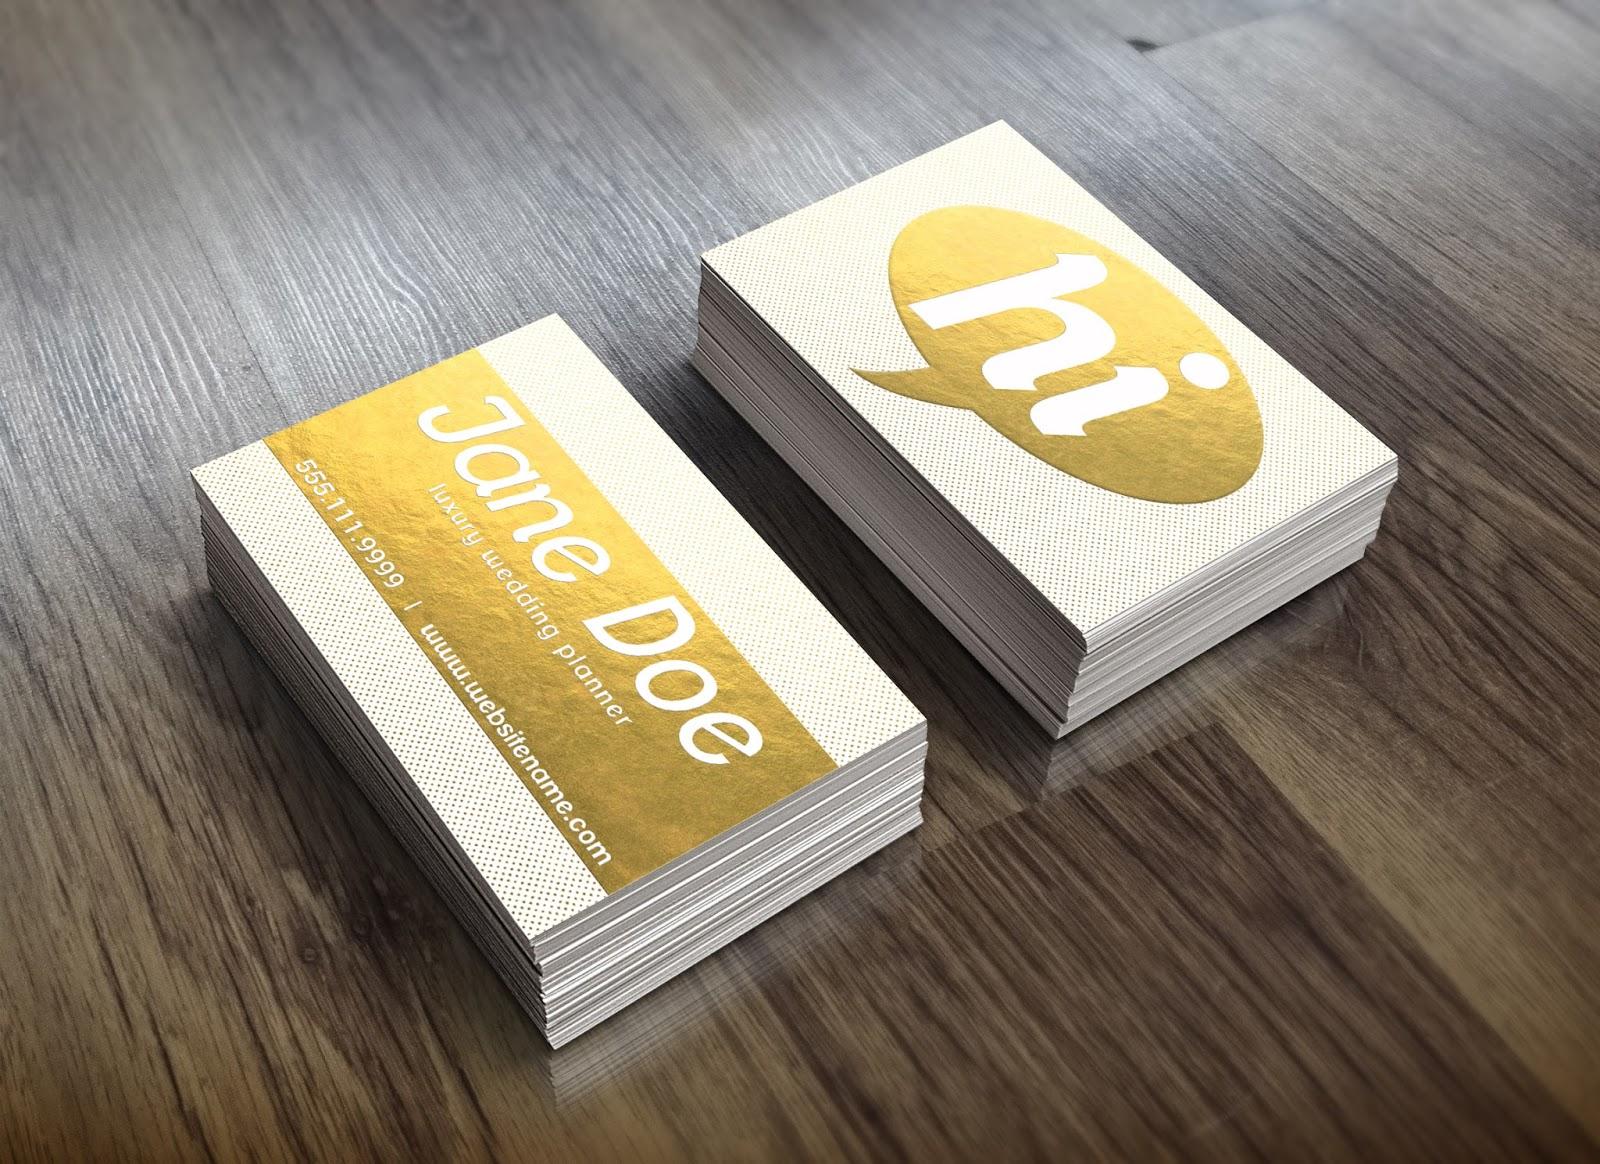 Foil business cards business card tips foil business cards colourmoves